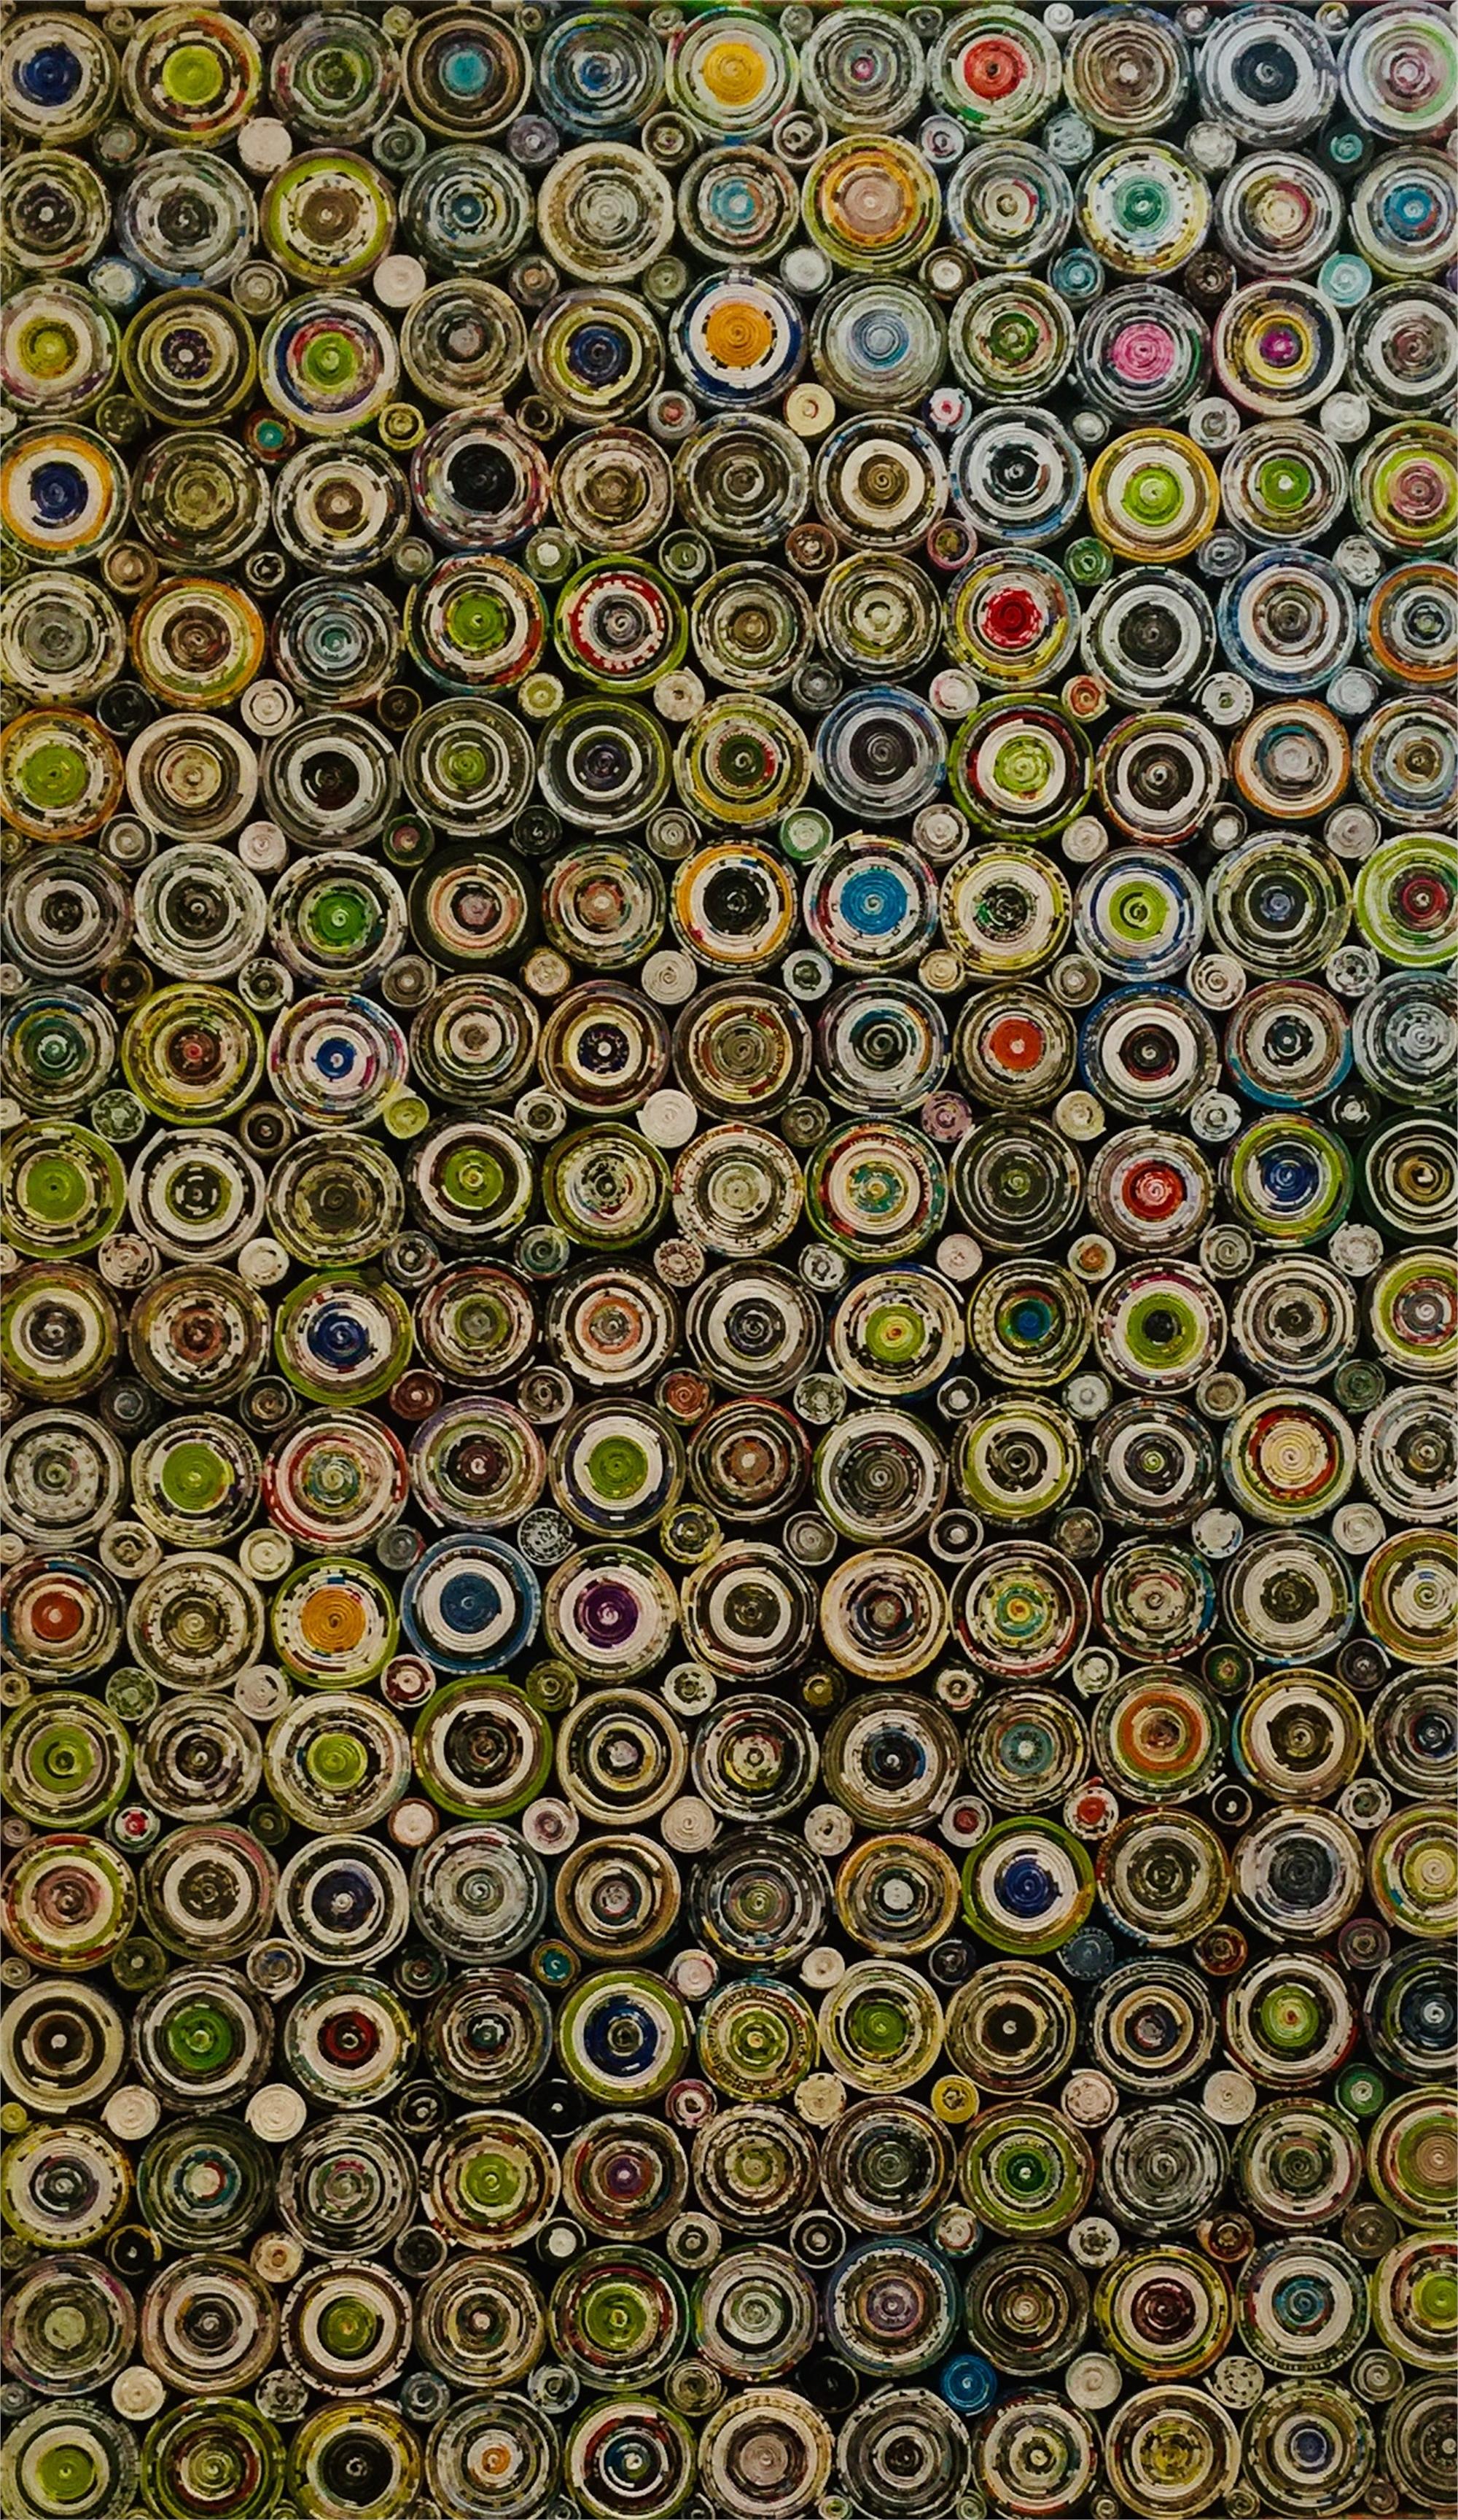 Media Magic Flat Circles by Sumath Kusu Maso